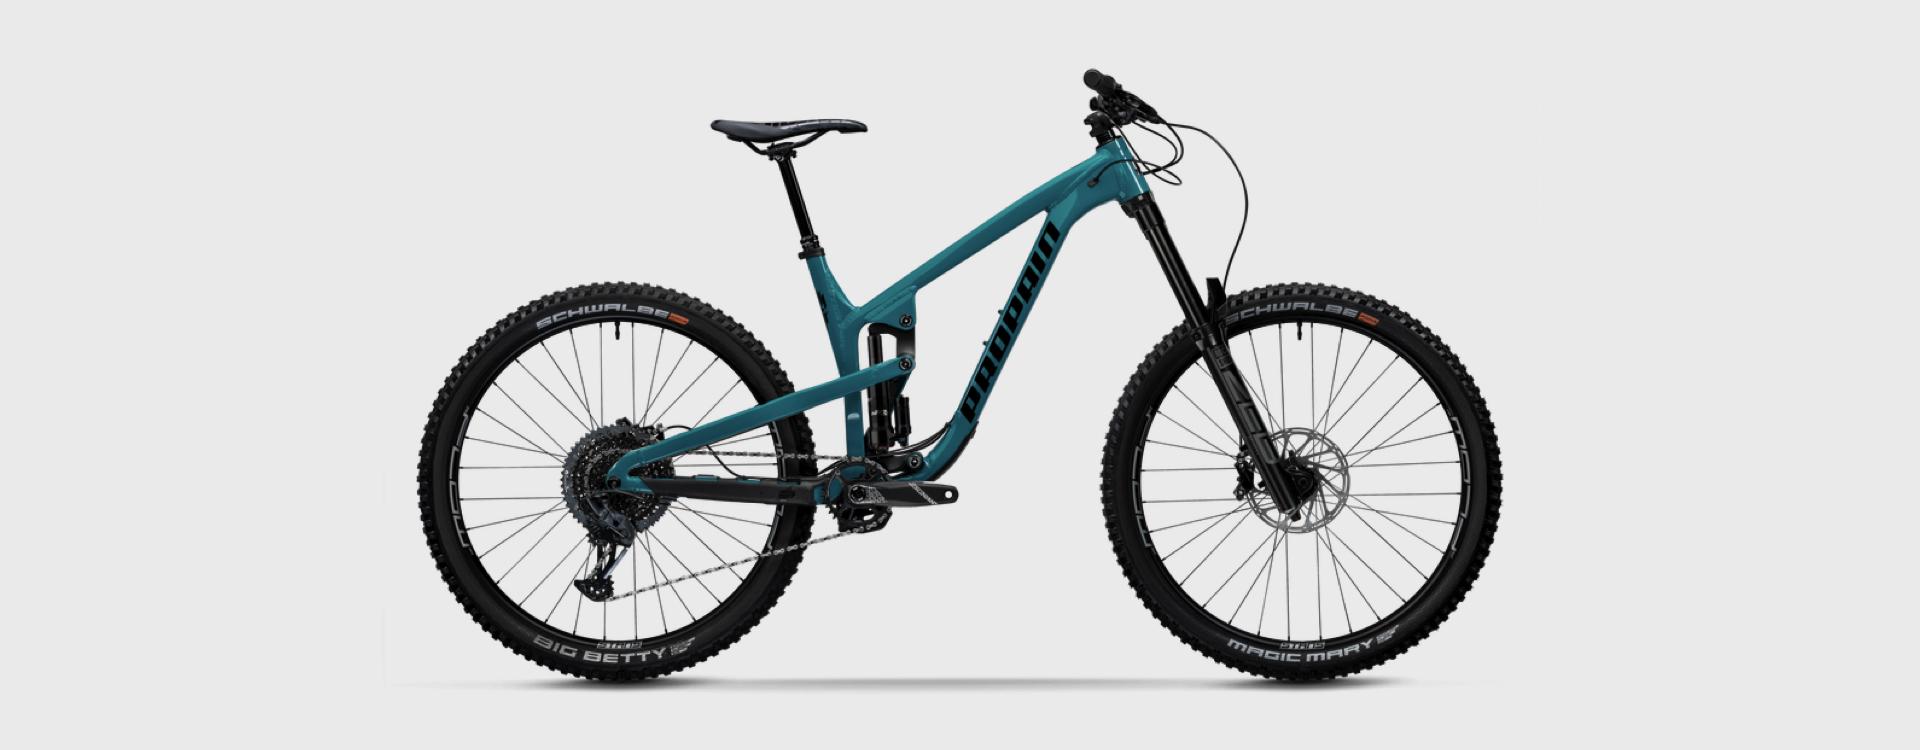 Bike Verleih Gummersbach Propain Bikes Testcenter NRW Spindrift 1 - AL - S - 650B - Petrol - 1920x750